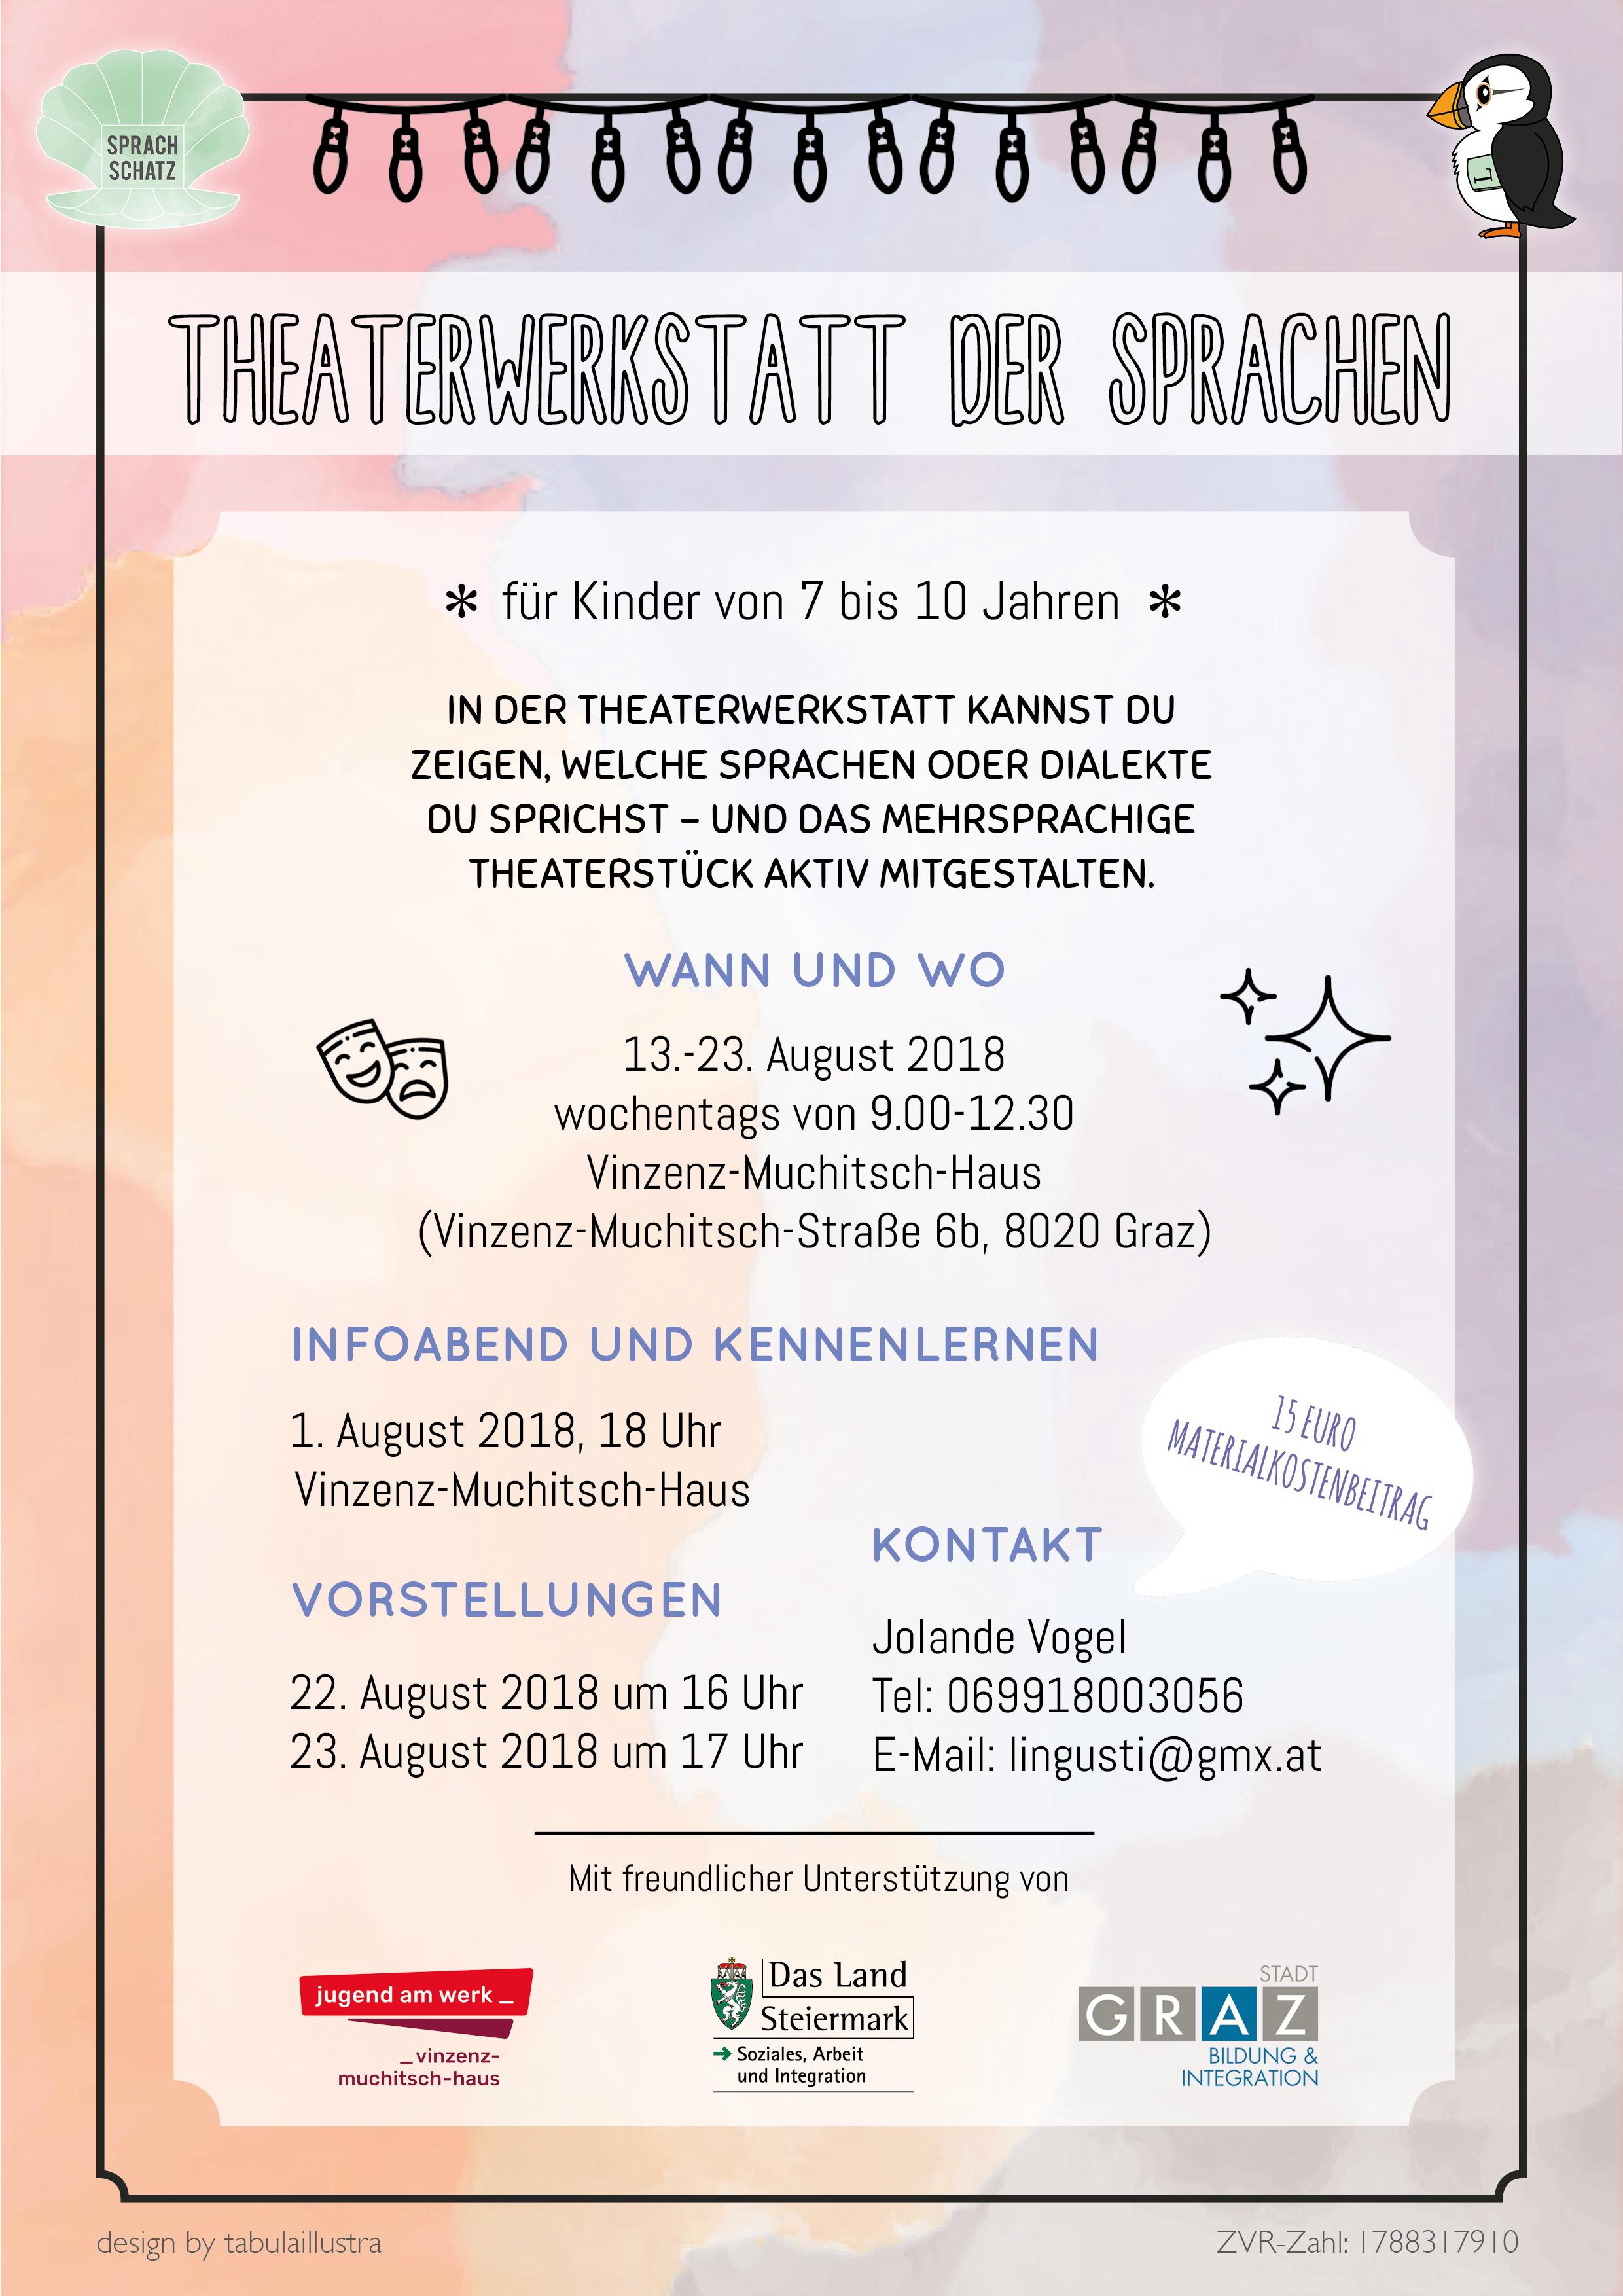 (Fast) Kostenlose Kinderbetreuung in Graz